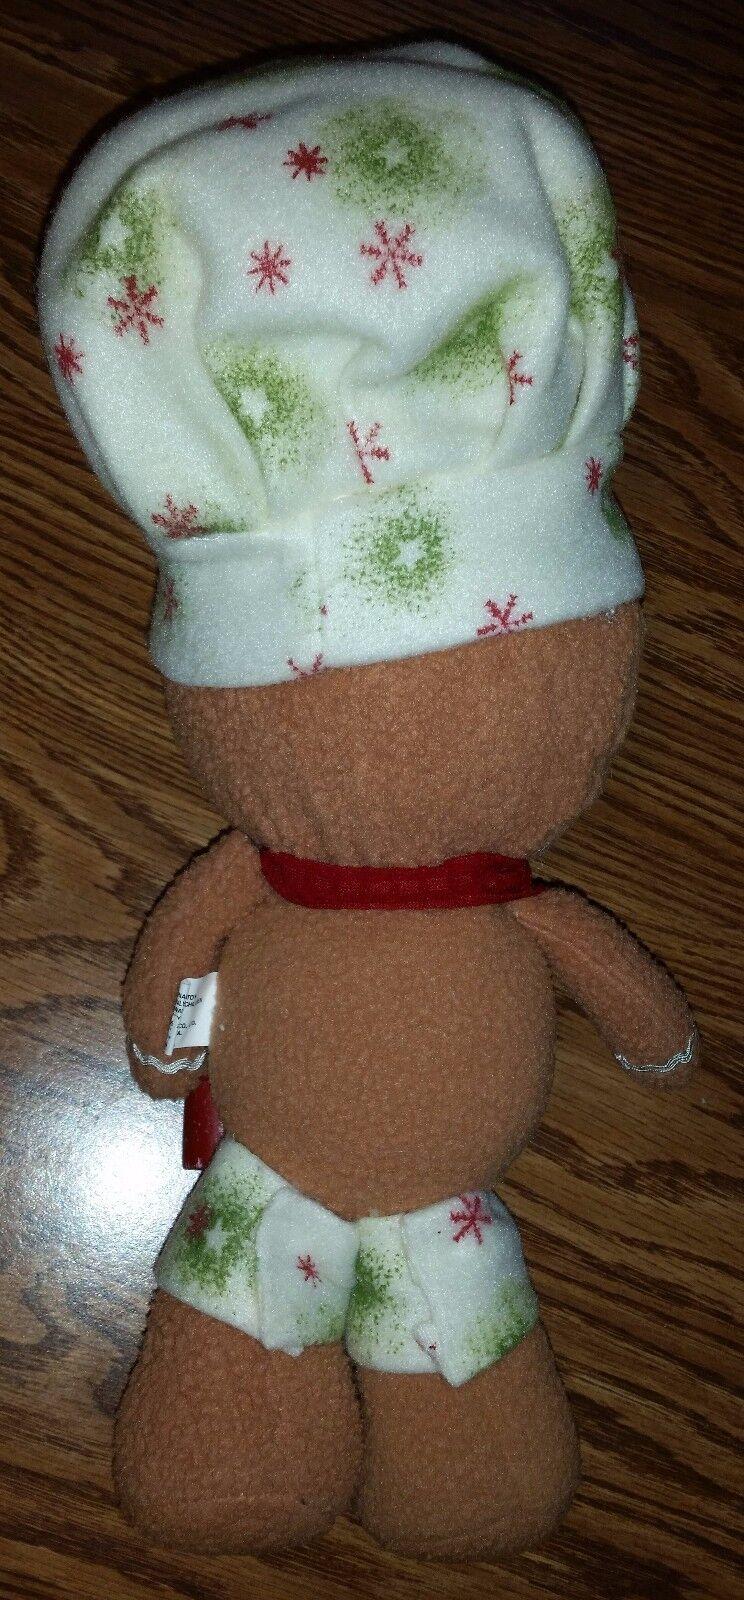 Christmas Gingerbread Man Man Man Peppermint Candy Chef Crafty Decoration Decor a539ce